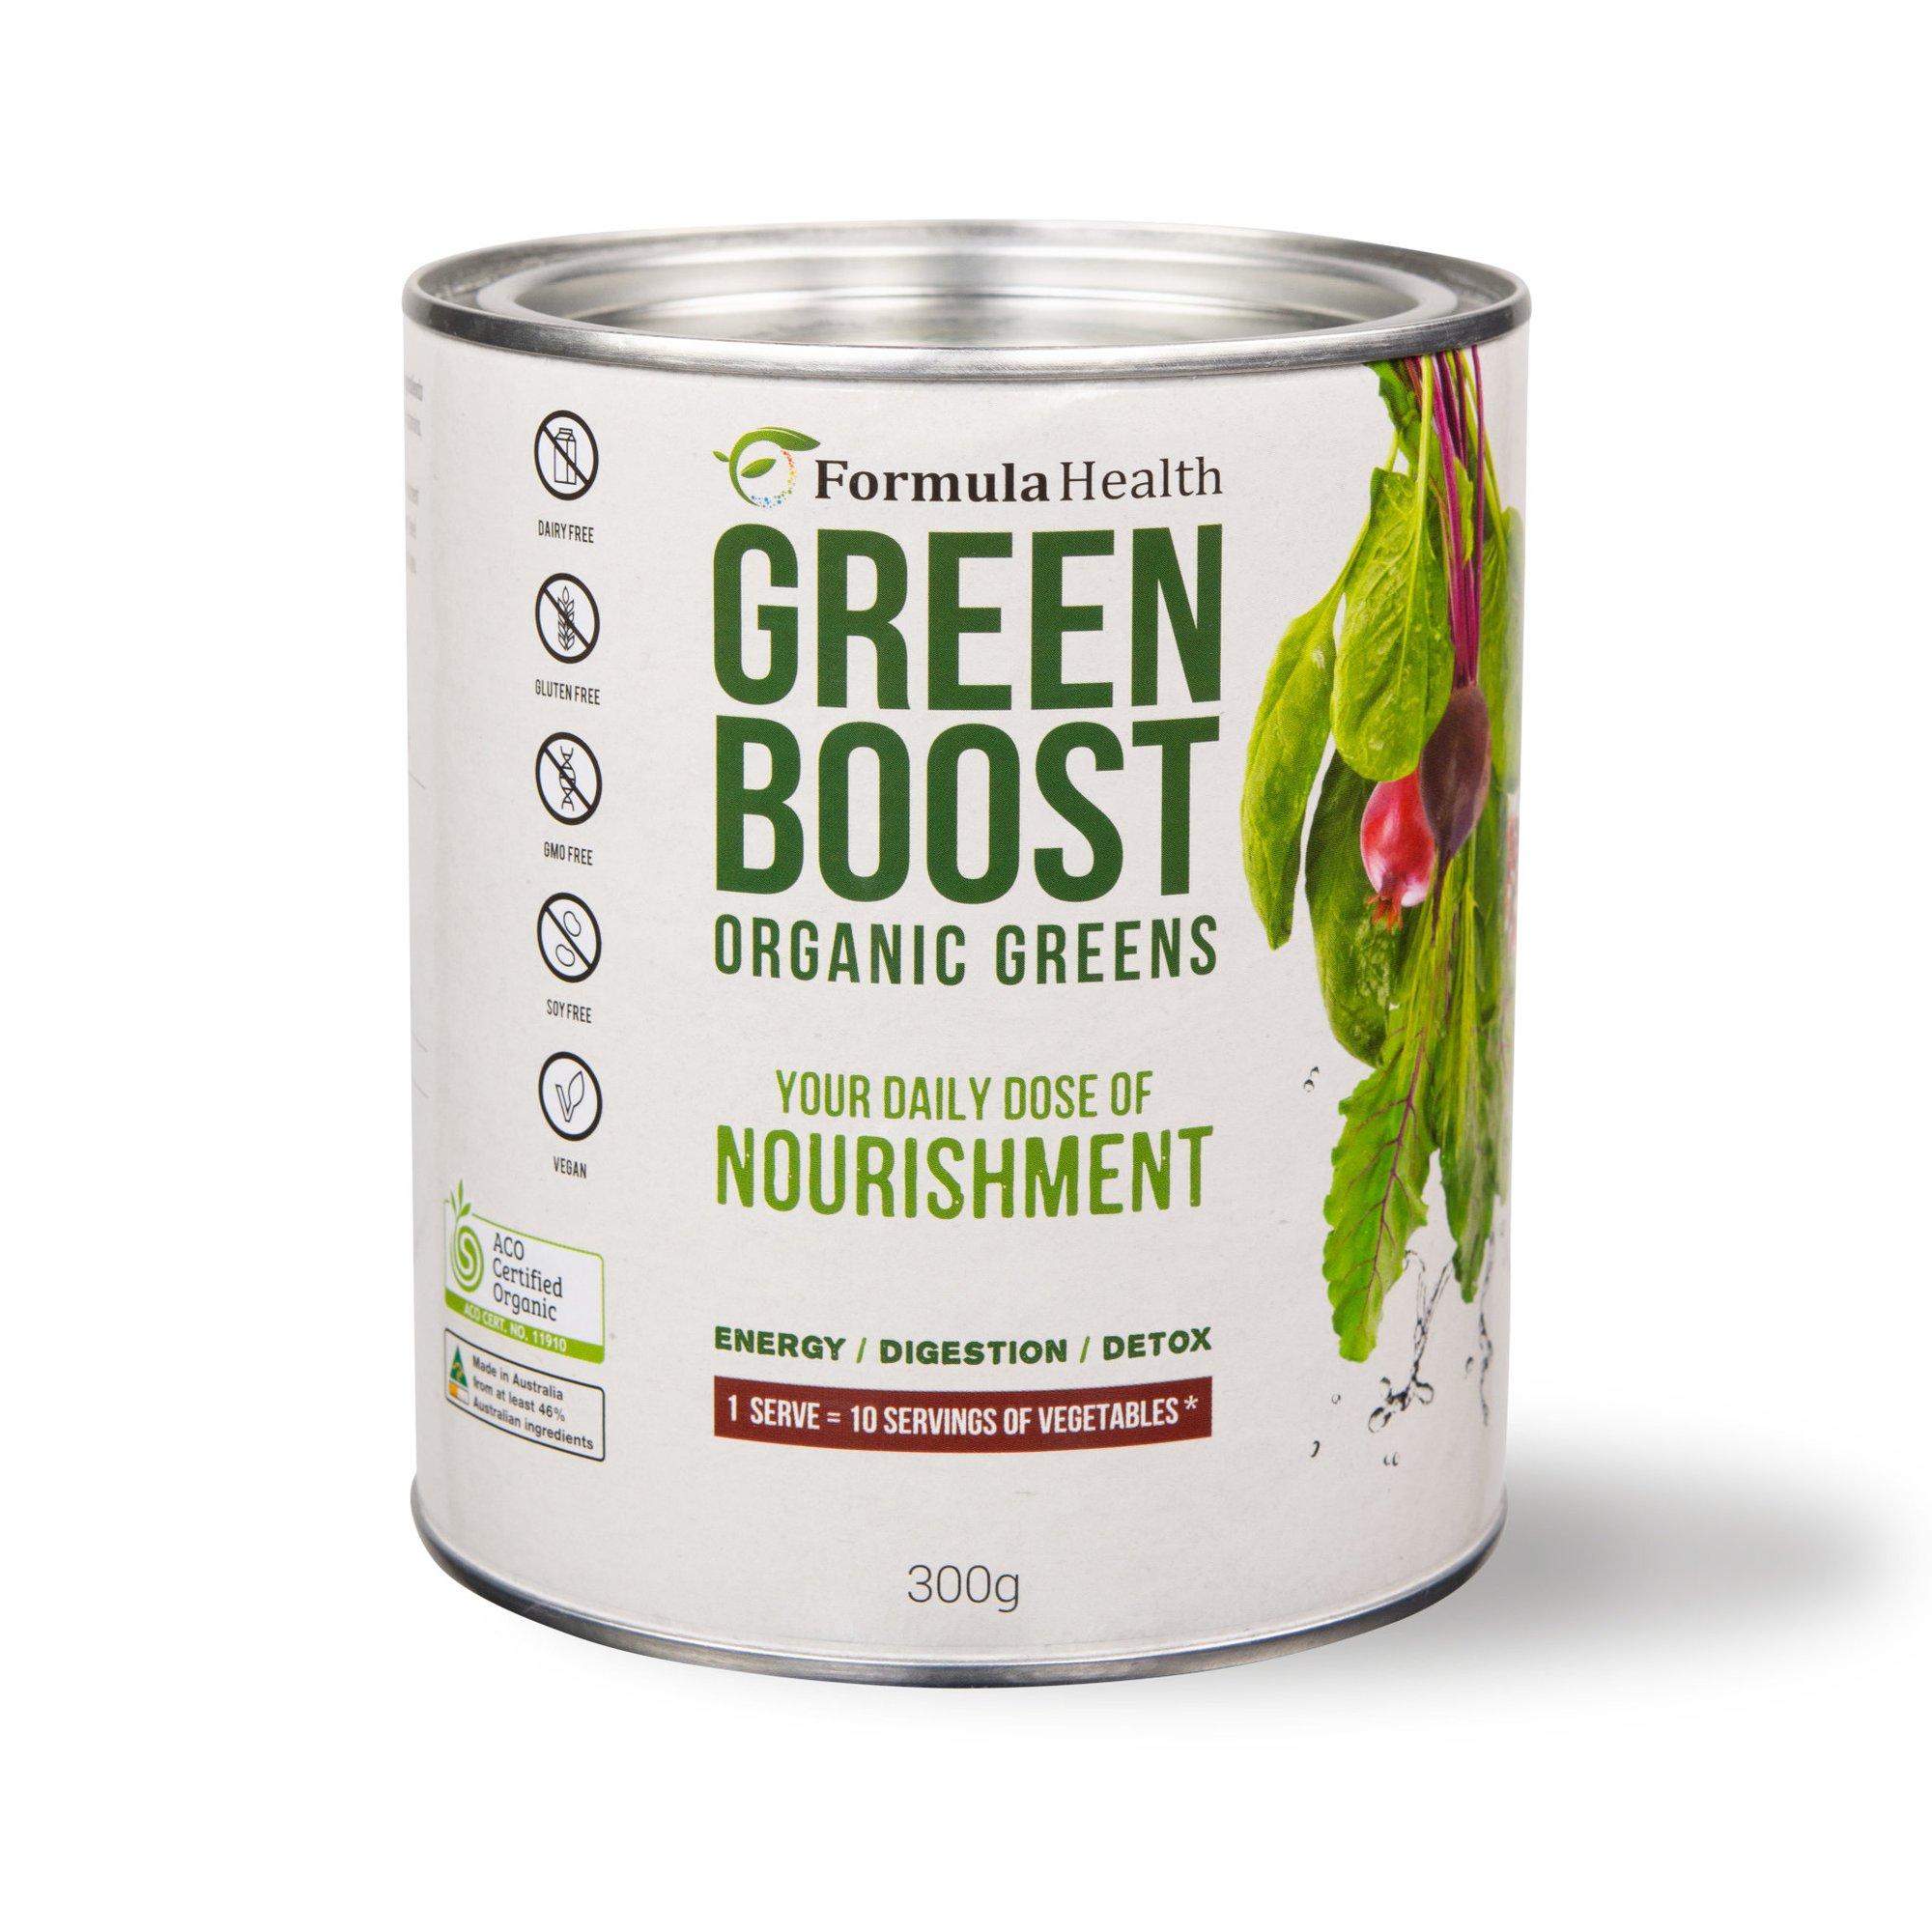 Formula Health Green Boost Organic Greens